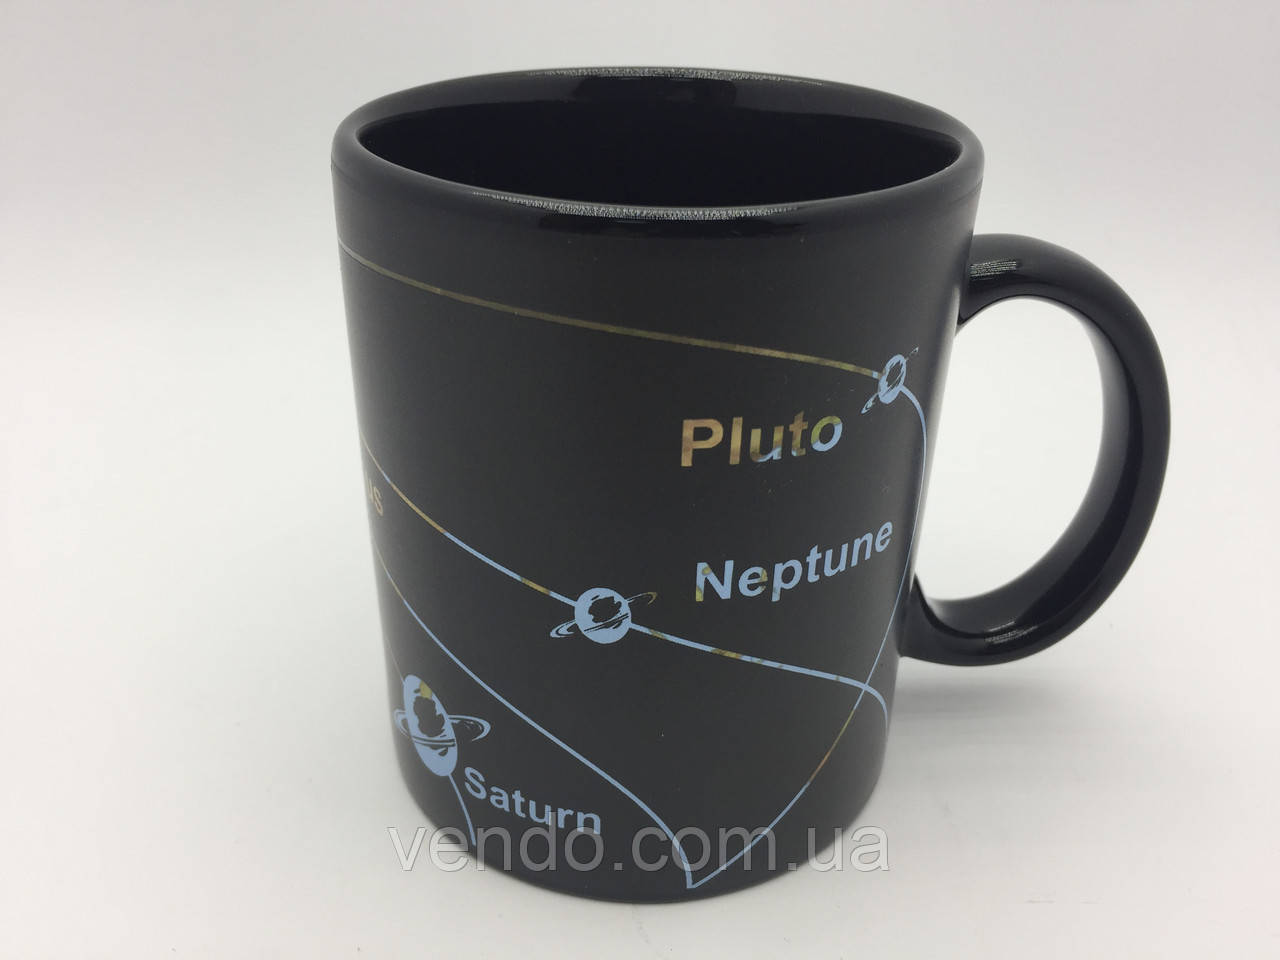 Кружка-чашка хамелеон с терморисунком SOLAR SYSTEM